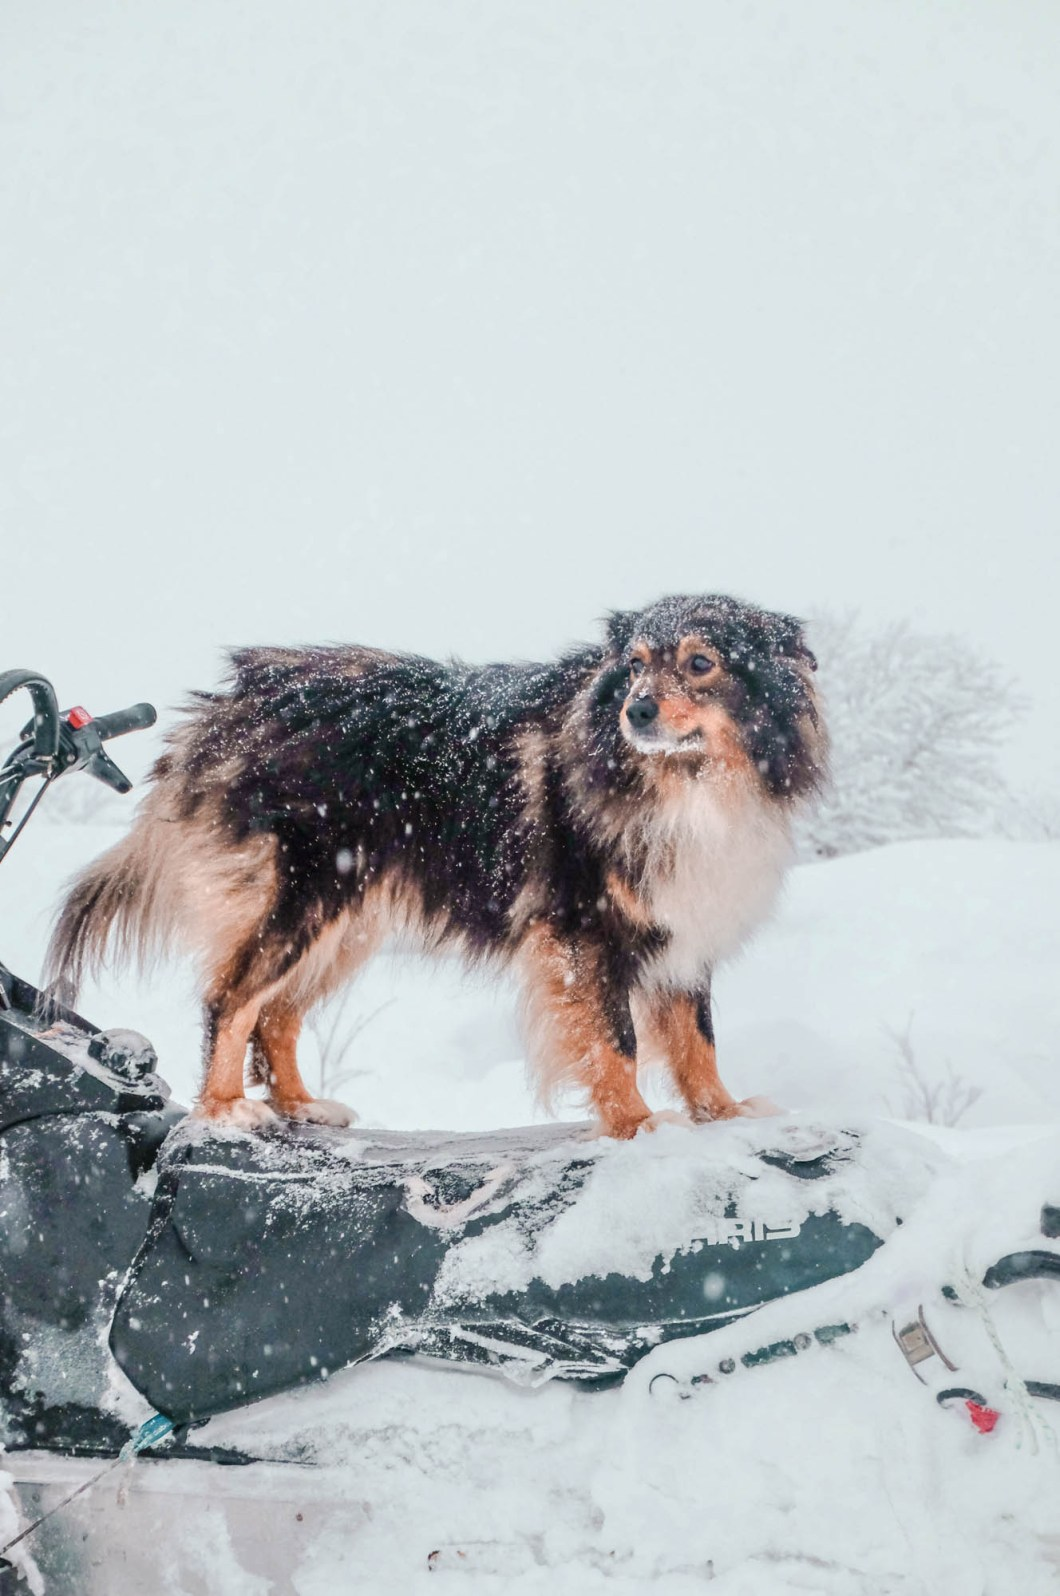 Dog riding snowmobile